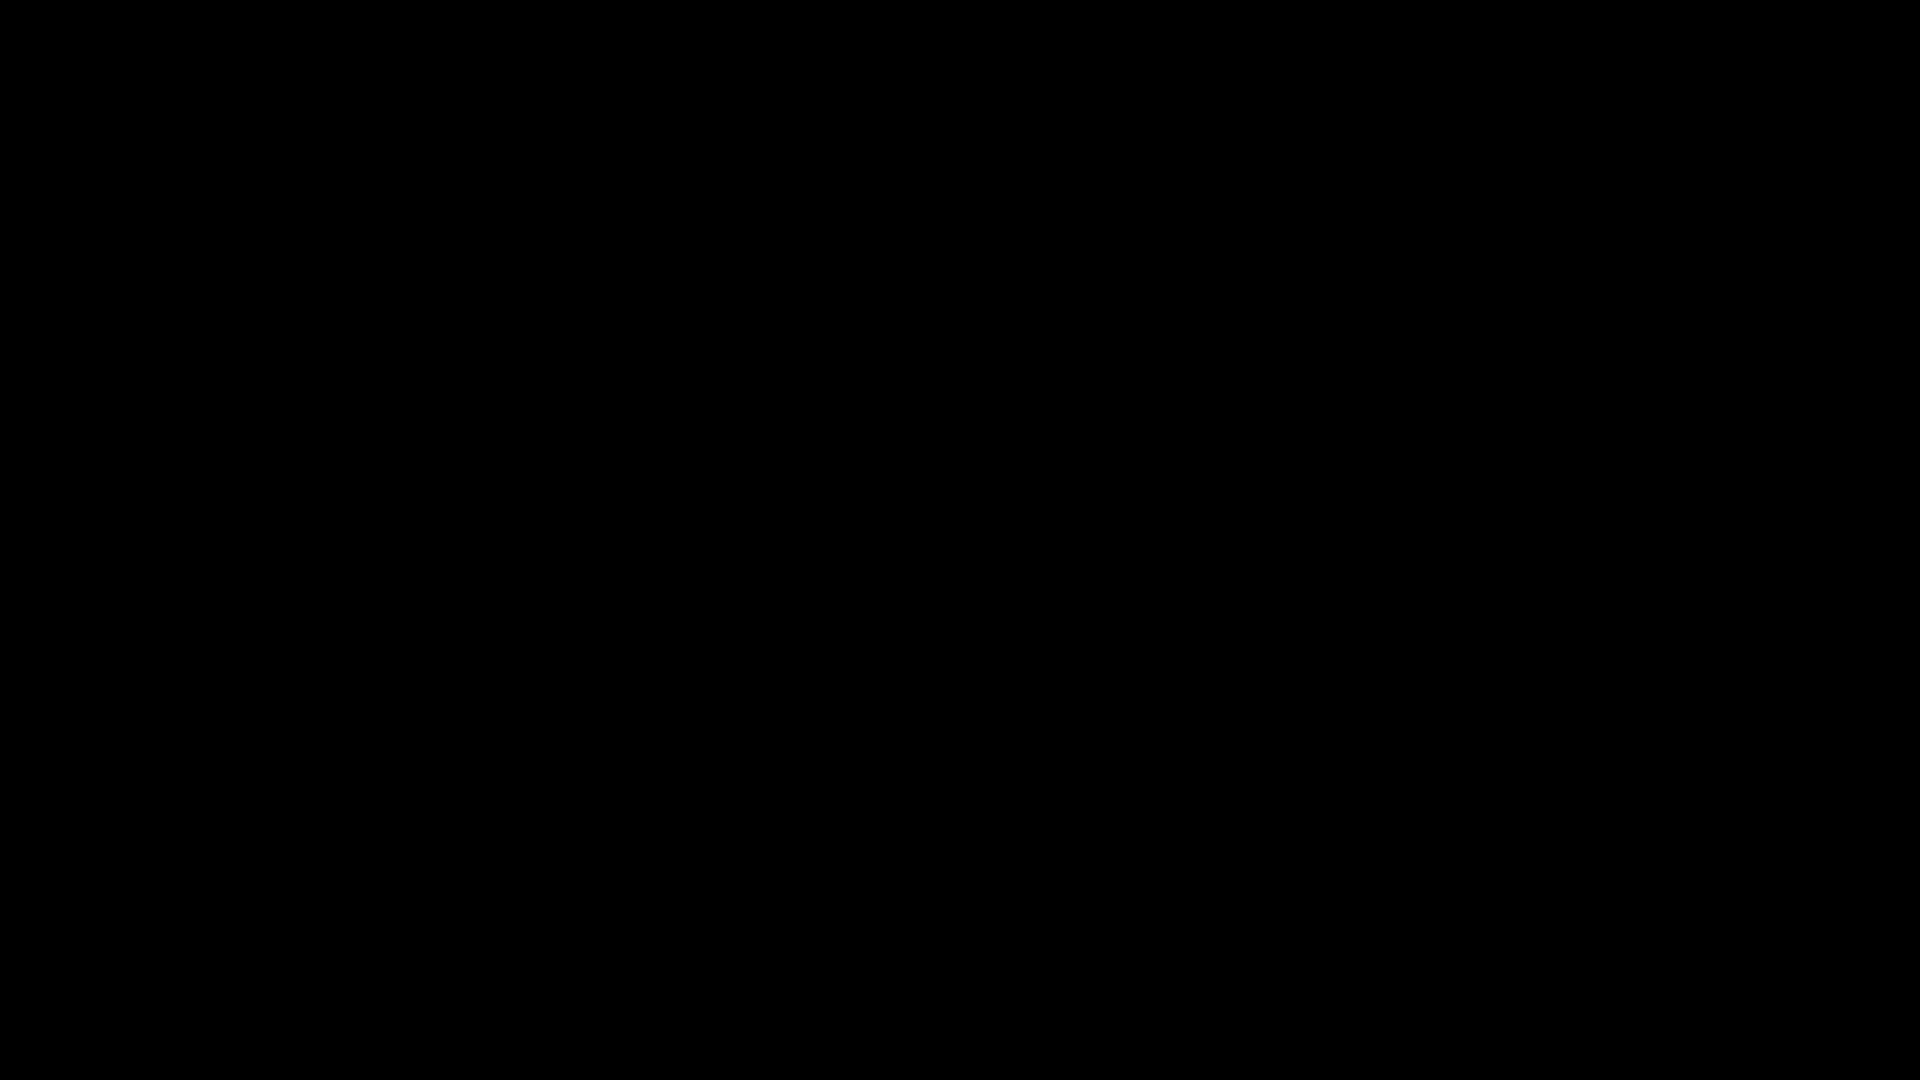 fo4, Sleepy Hollow confirmed. (reddit) GIFs